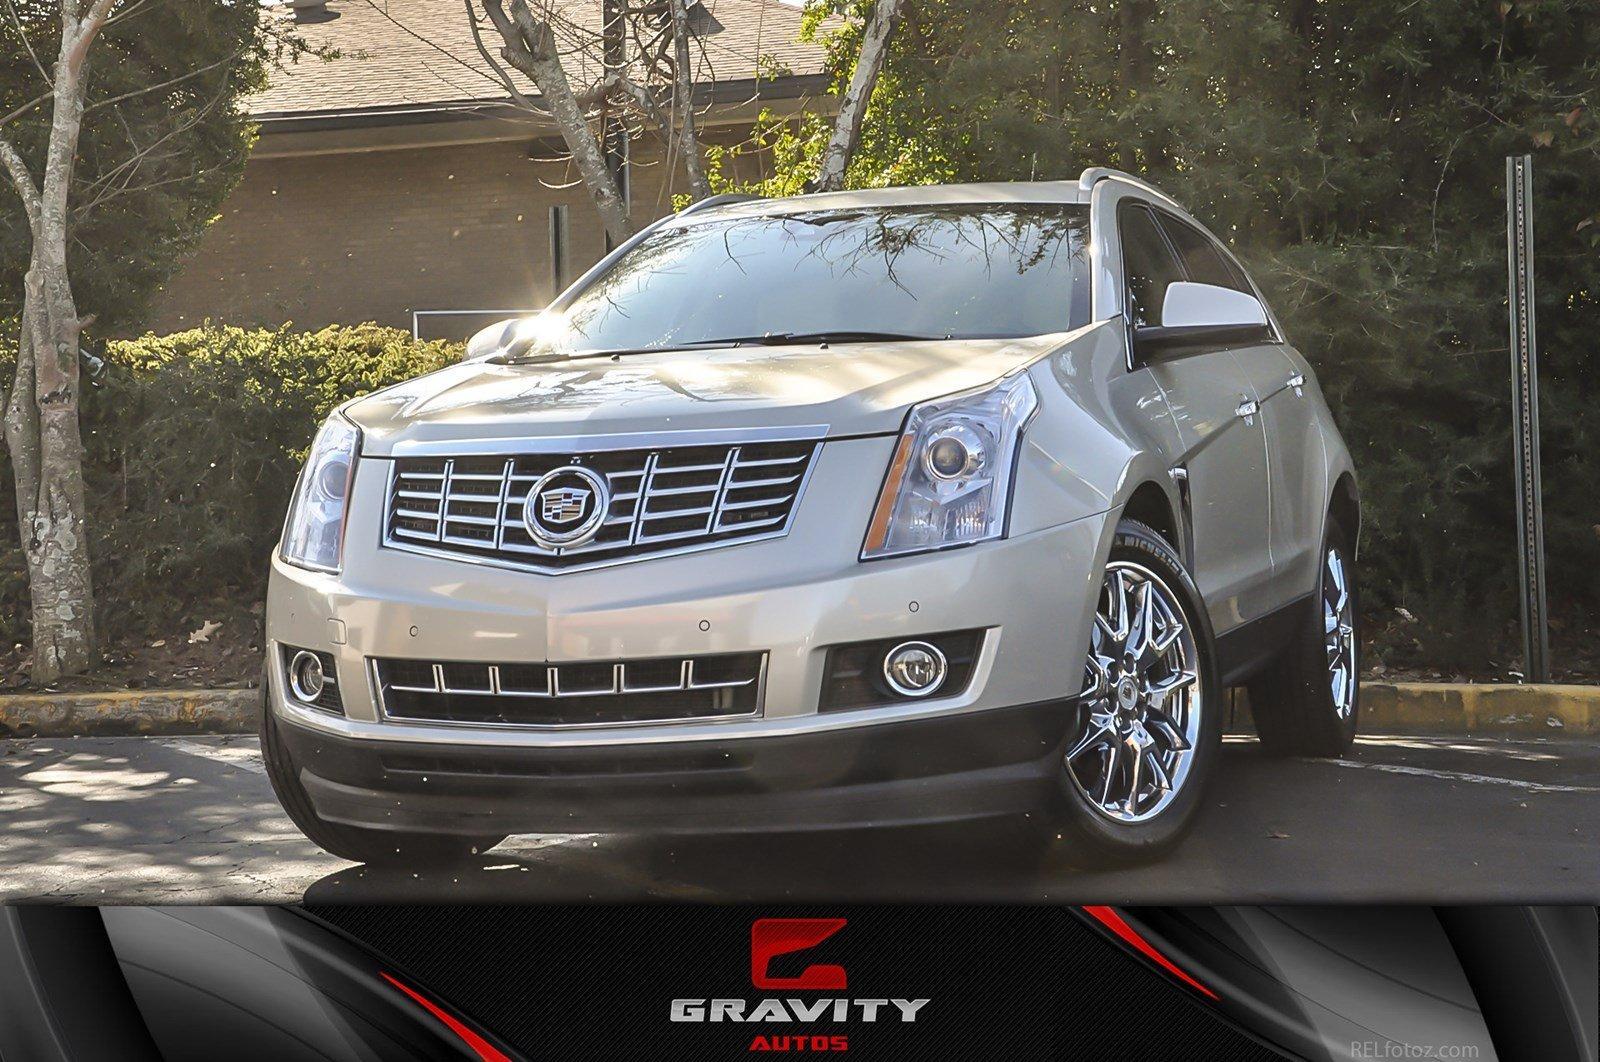 Gravity Autos Atlanta >> 2015 Cadillac Srx Srx Performance Collection Stock 534599